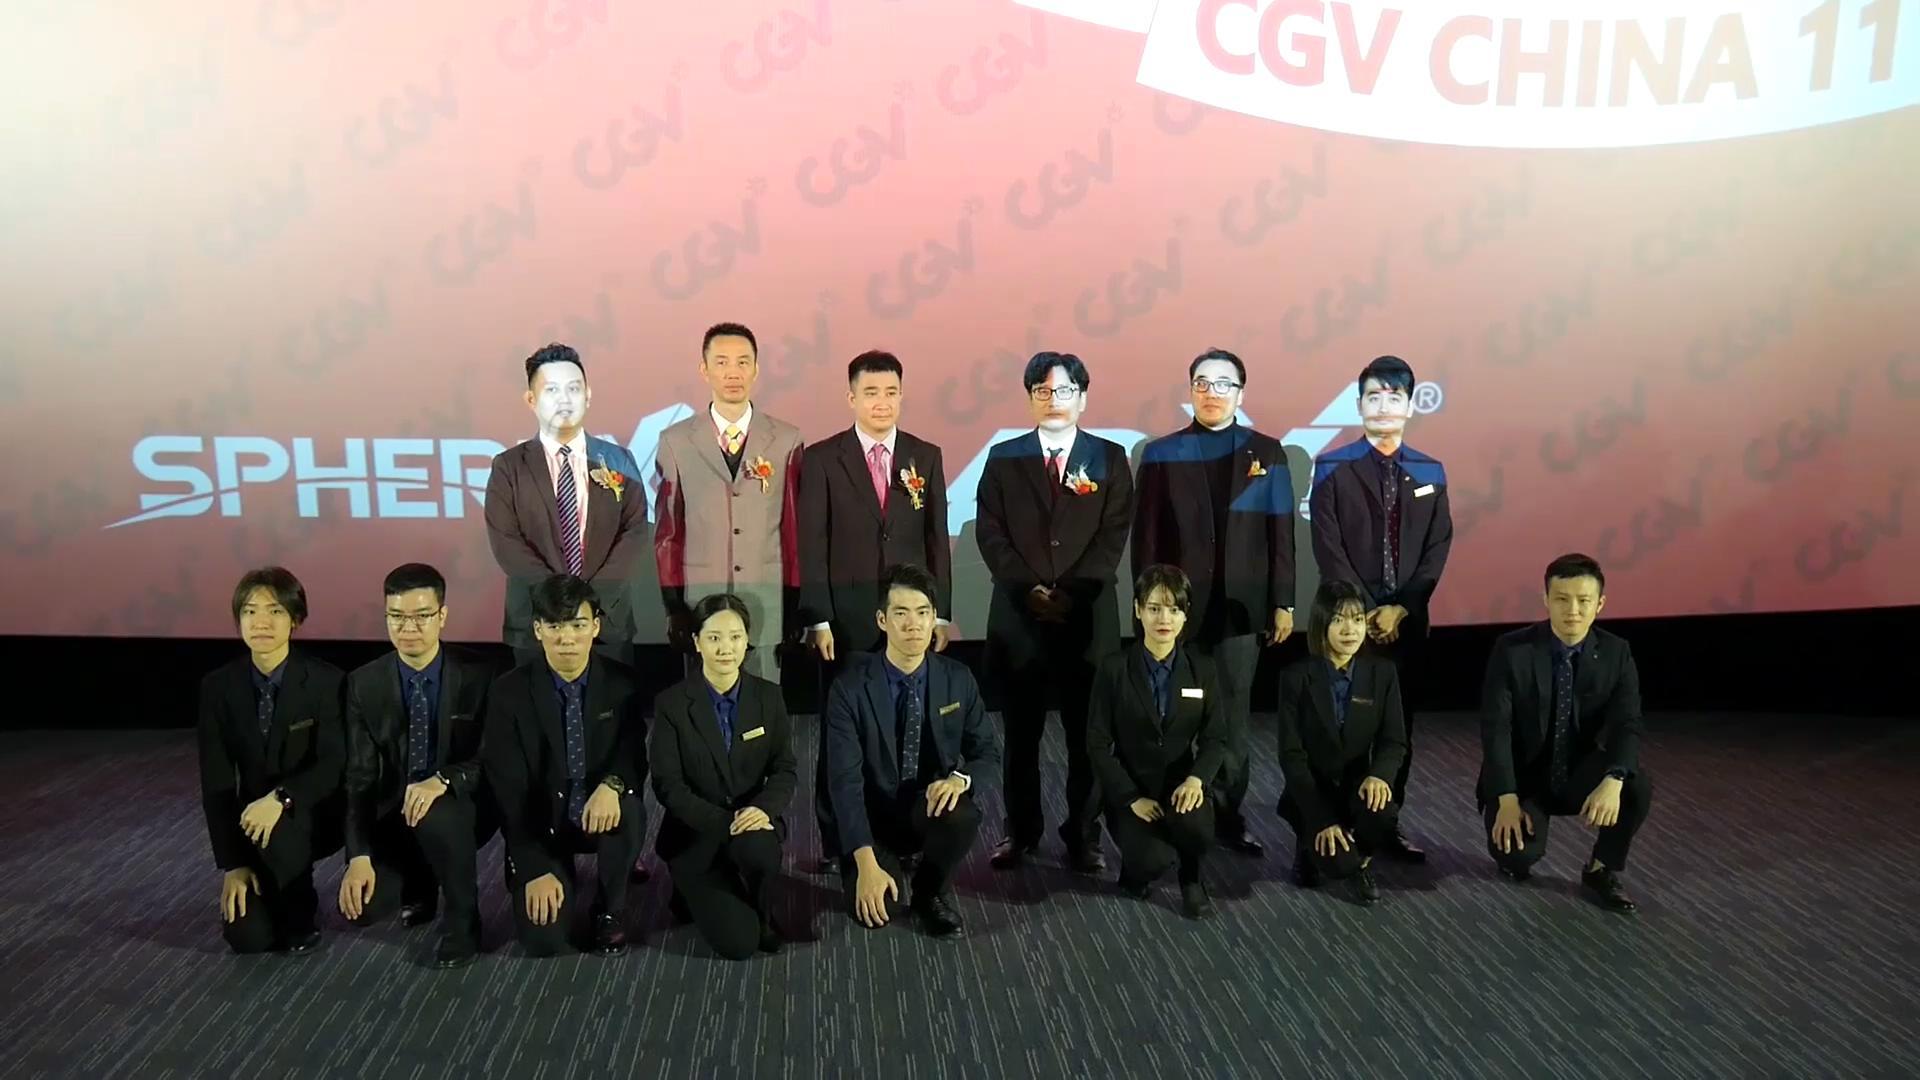 CGV影城广州添新店 影迷观影体验再升级